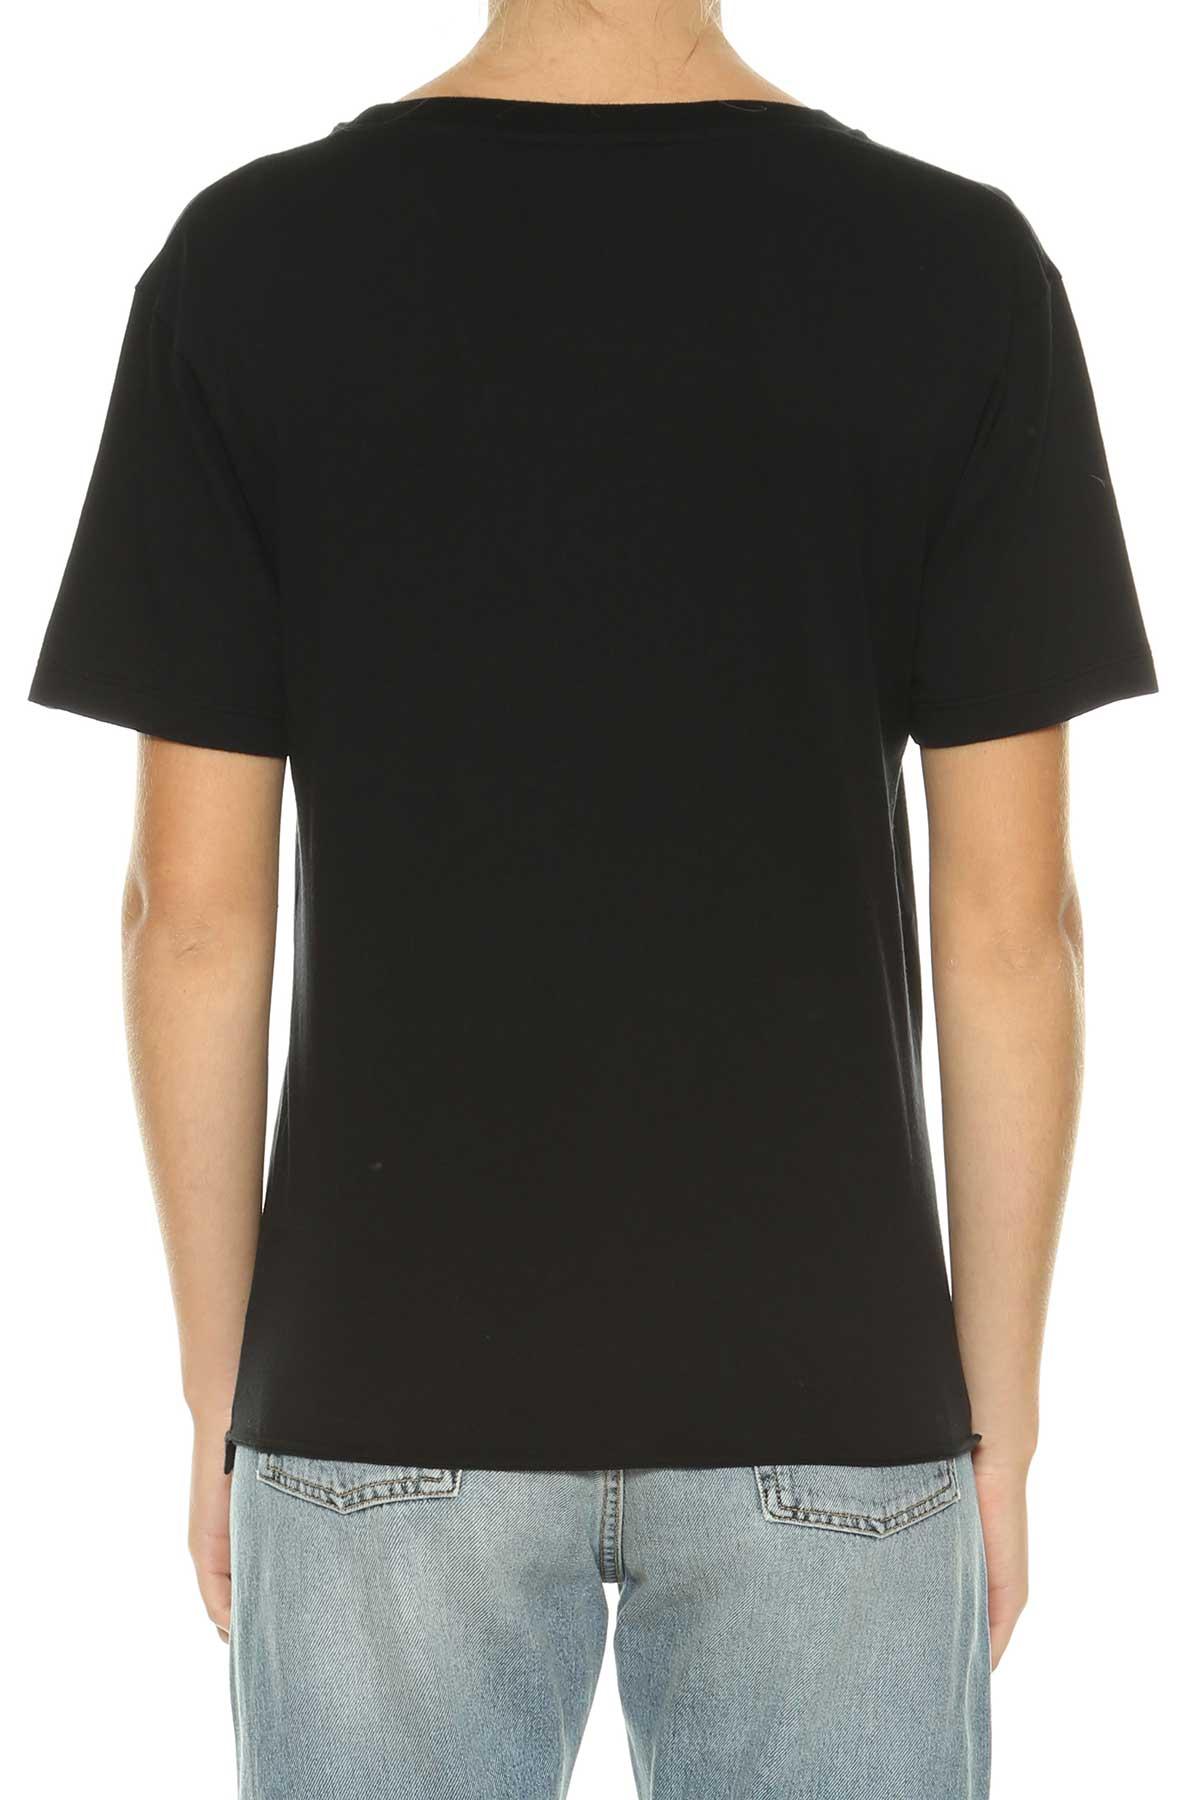 Saint laurent saint laurent ysl printed t shirt nero for Saint laurent shirt womens